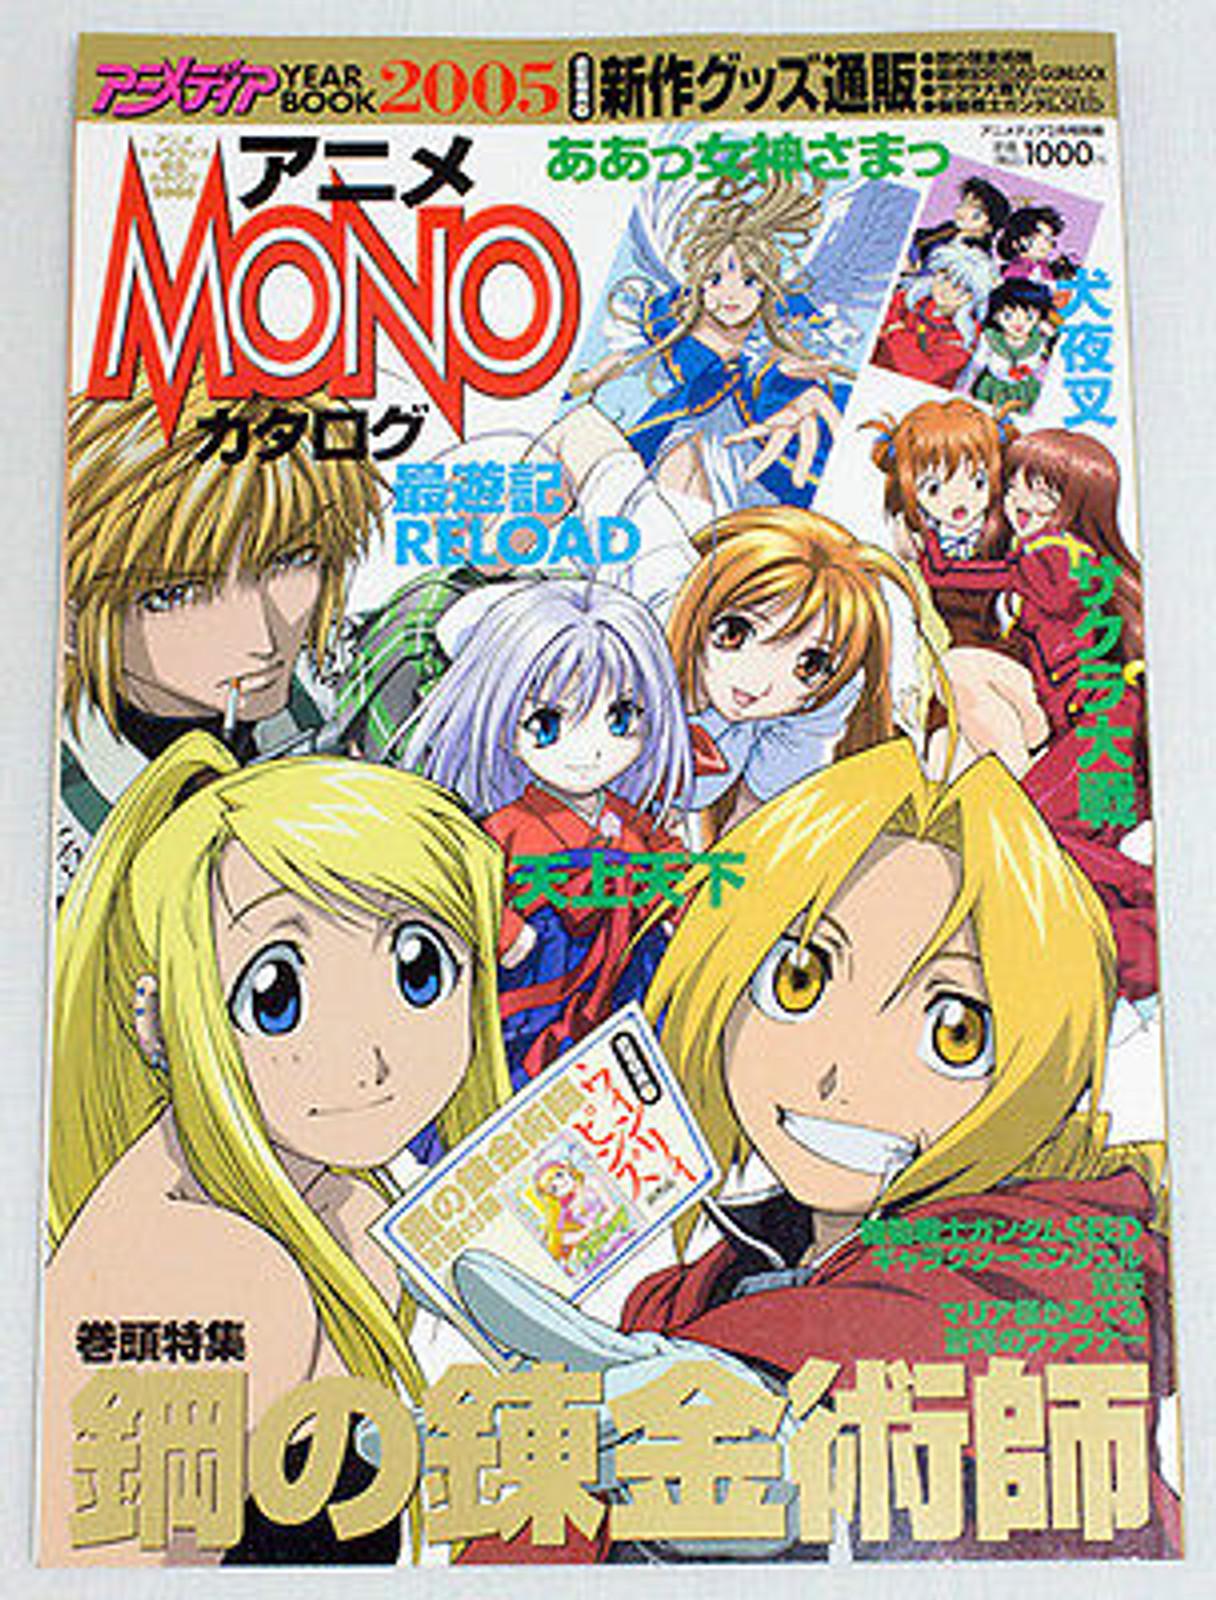 Anime MONO Catalog 2005 Animedia Year Book Japanese Anime Goods JAPAN